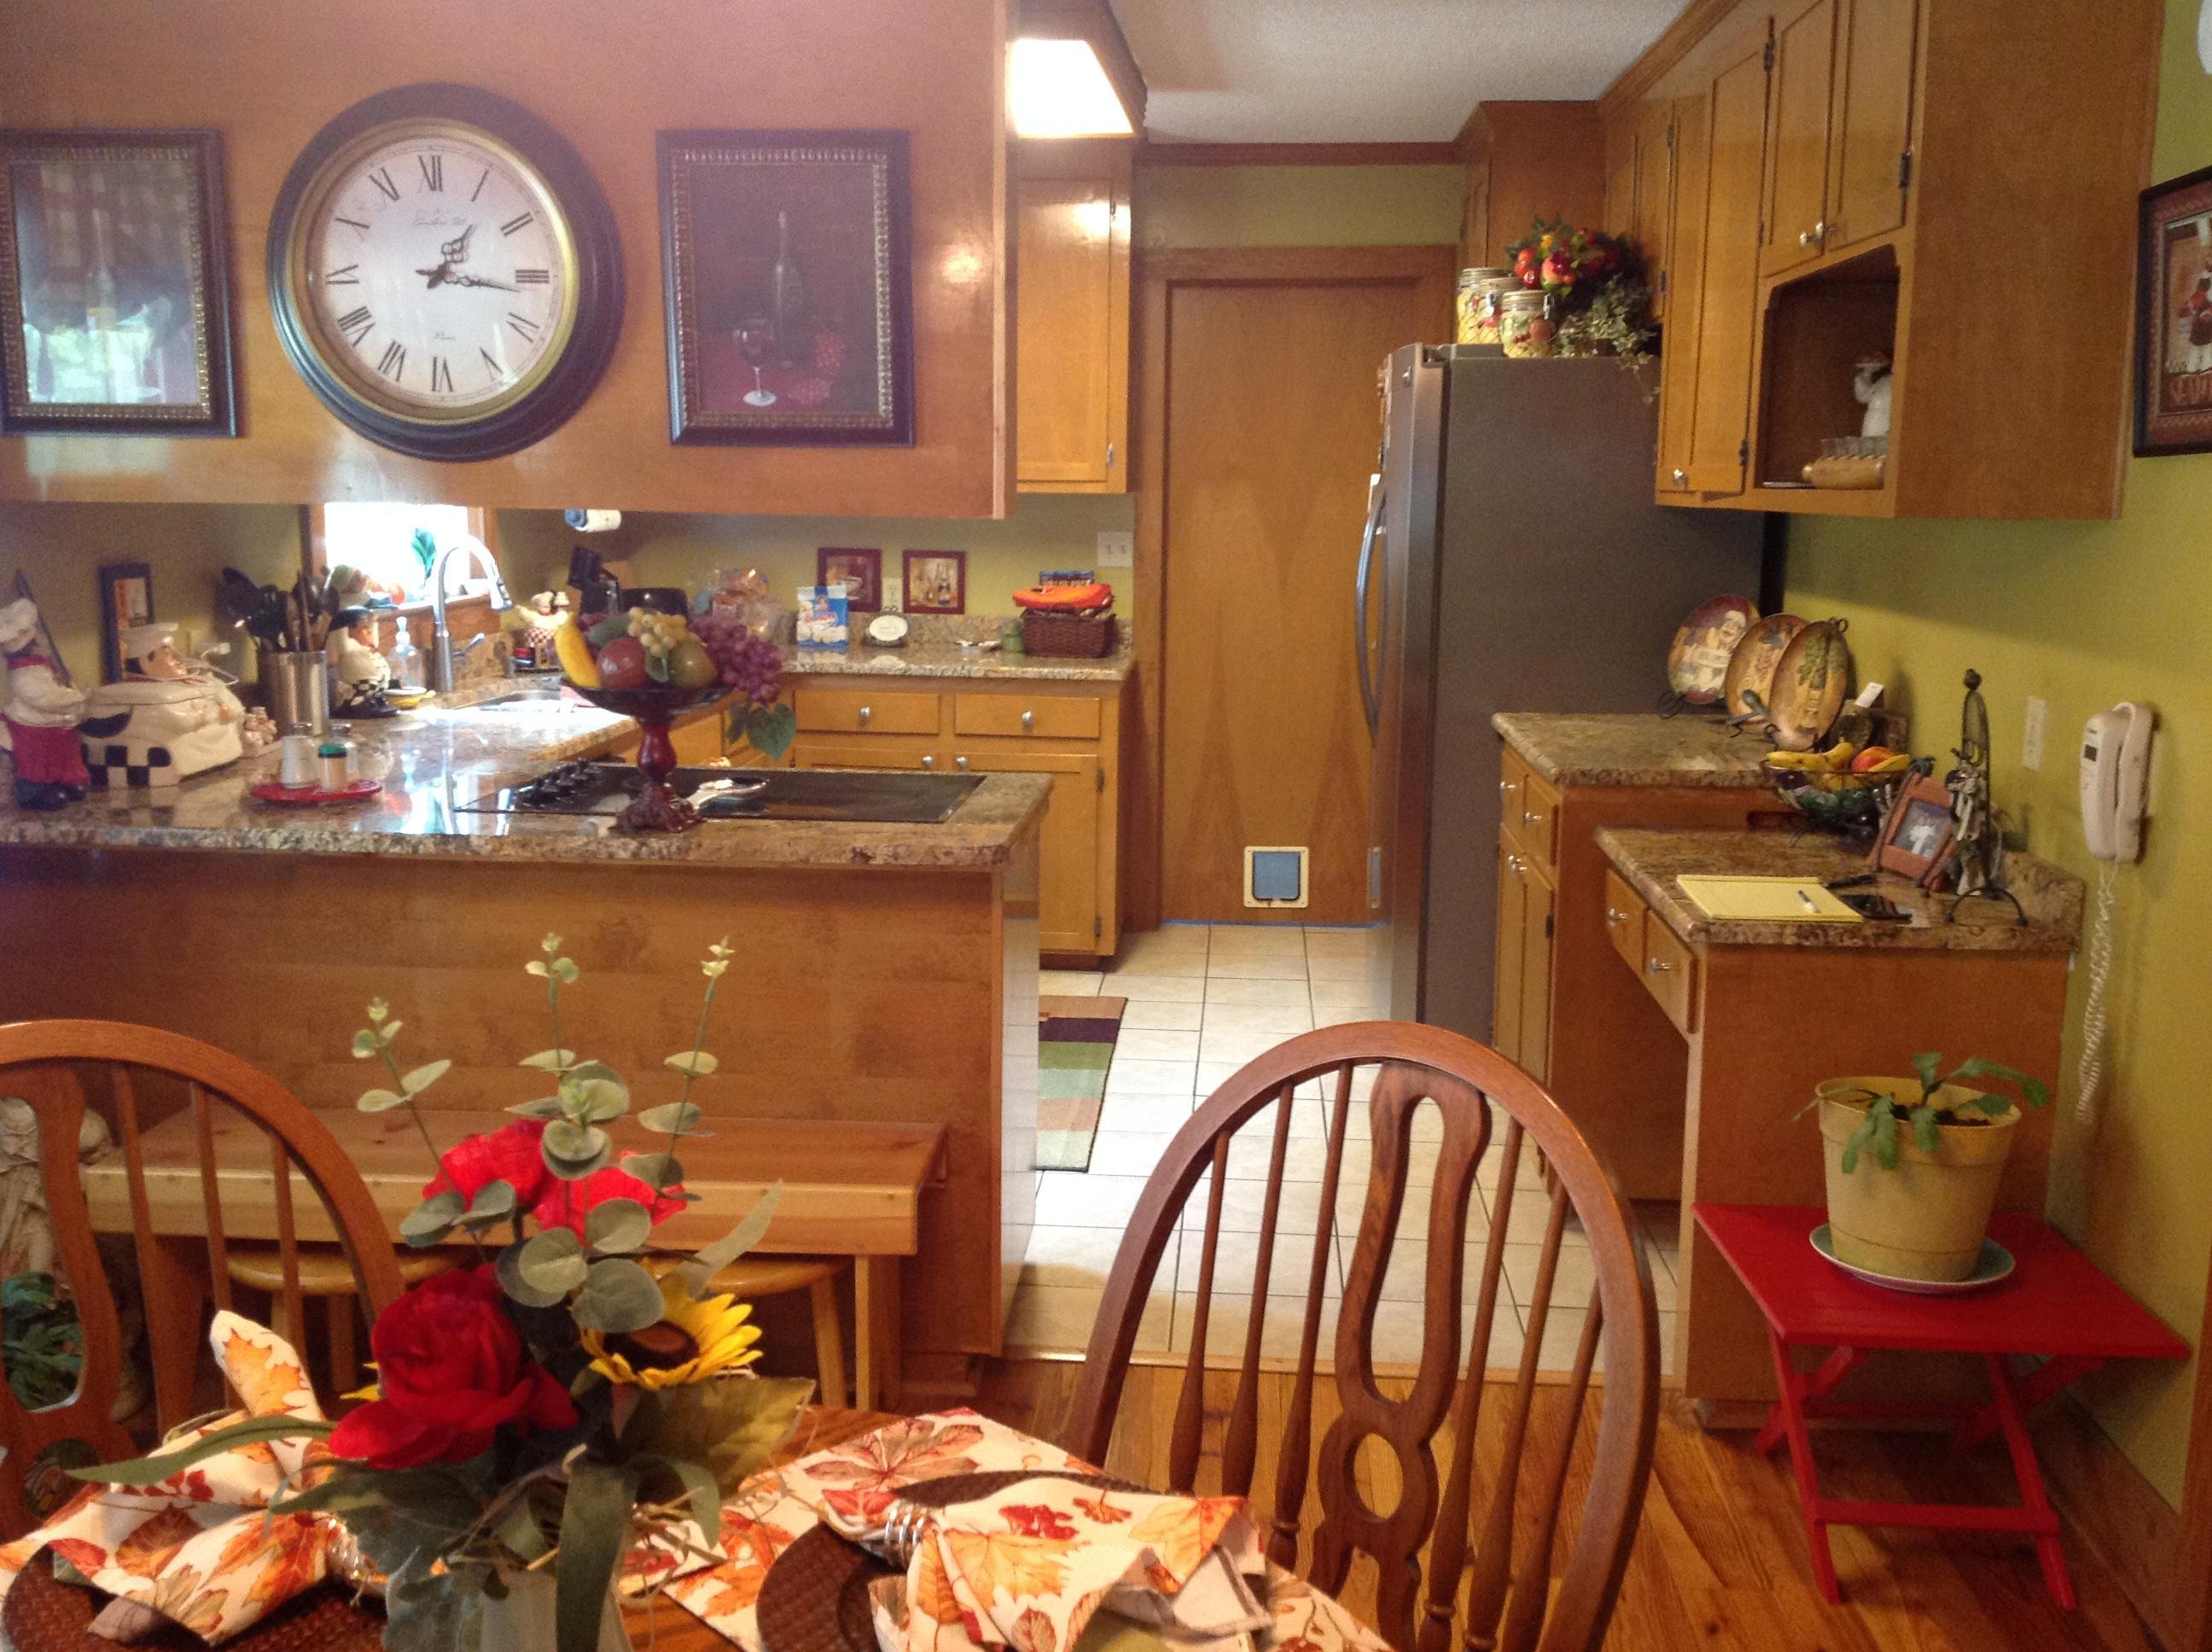 Belvedere II Homes For Sale - 122 Dogwood, Eutawville, SC - 25